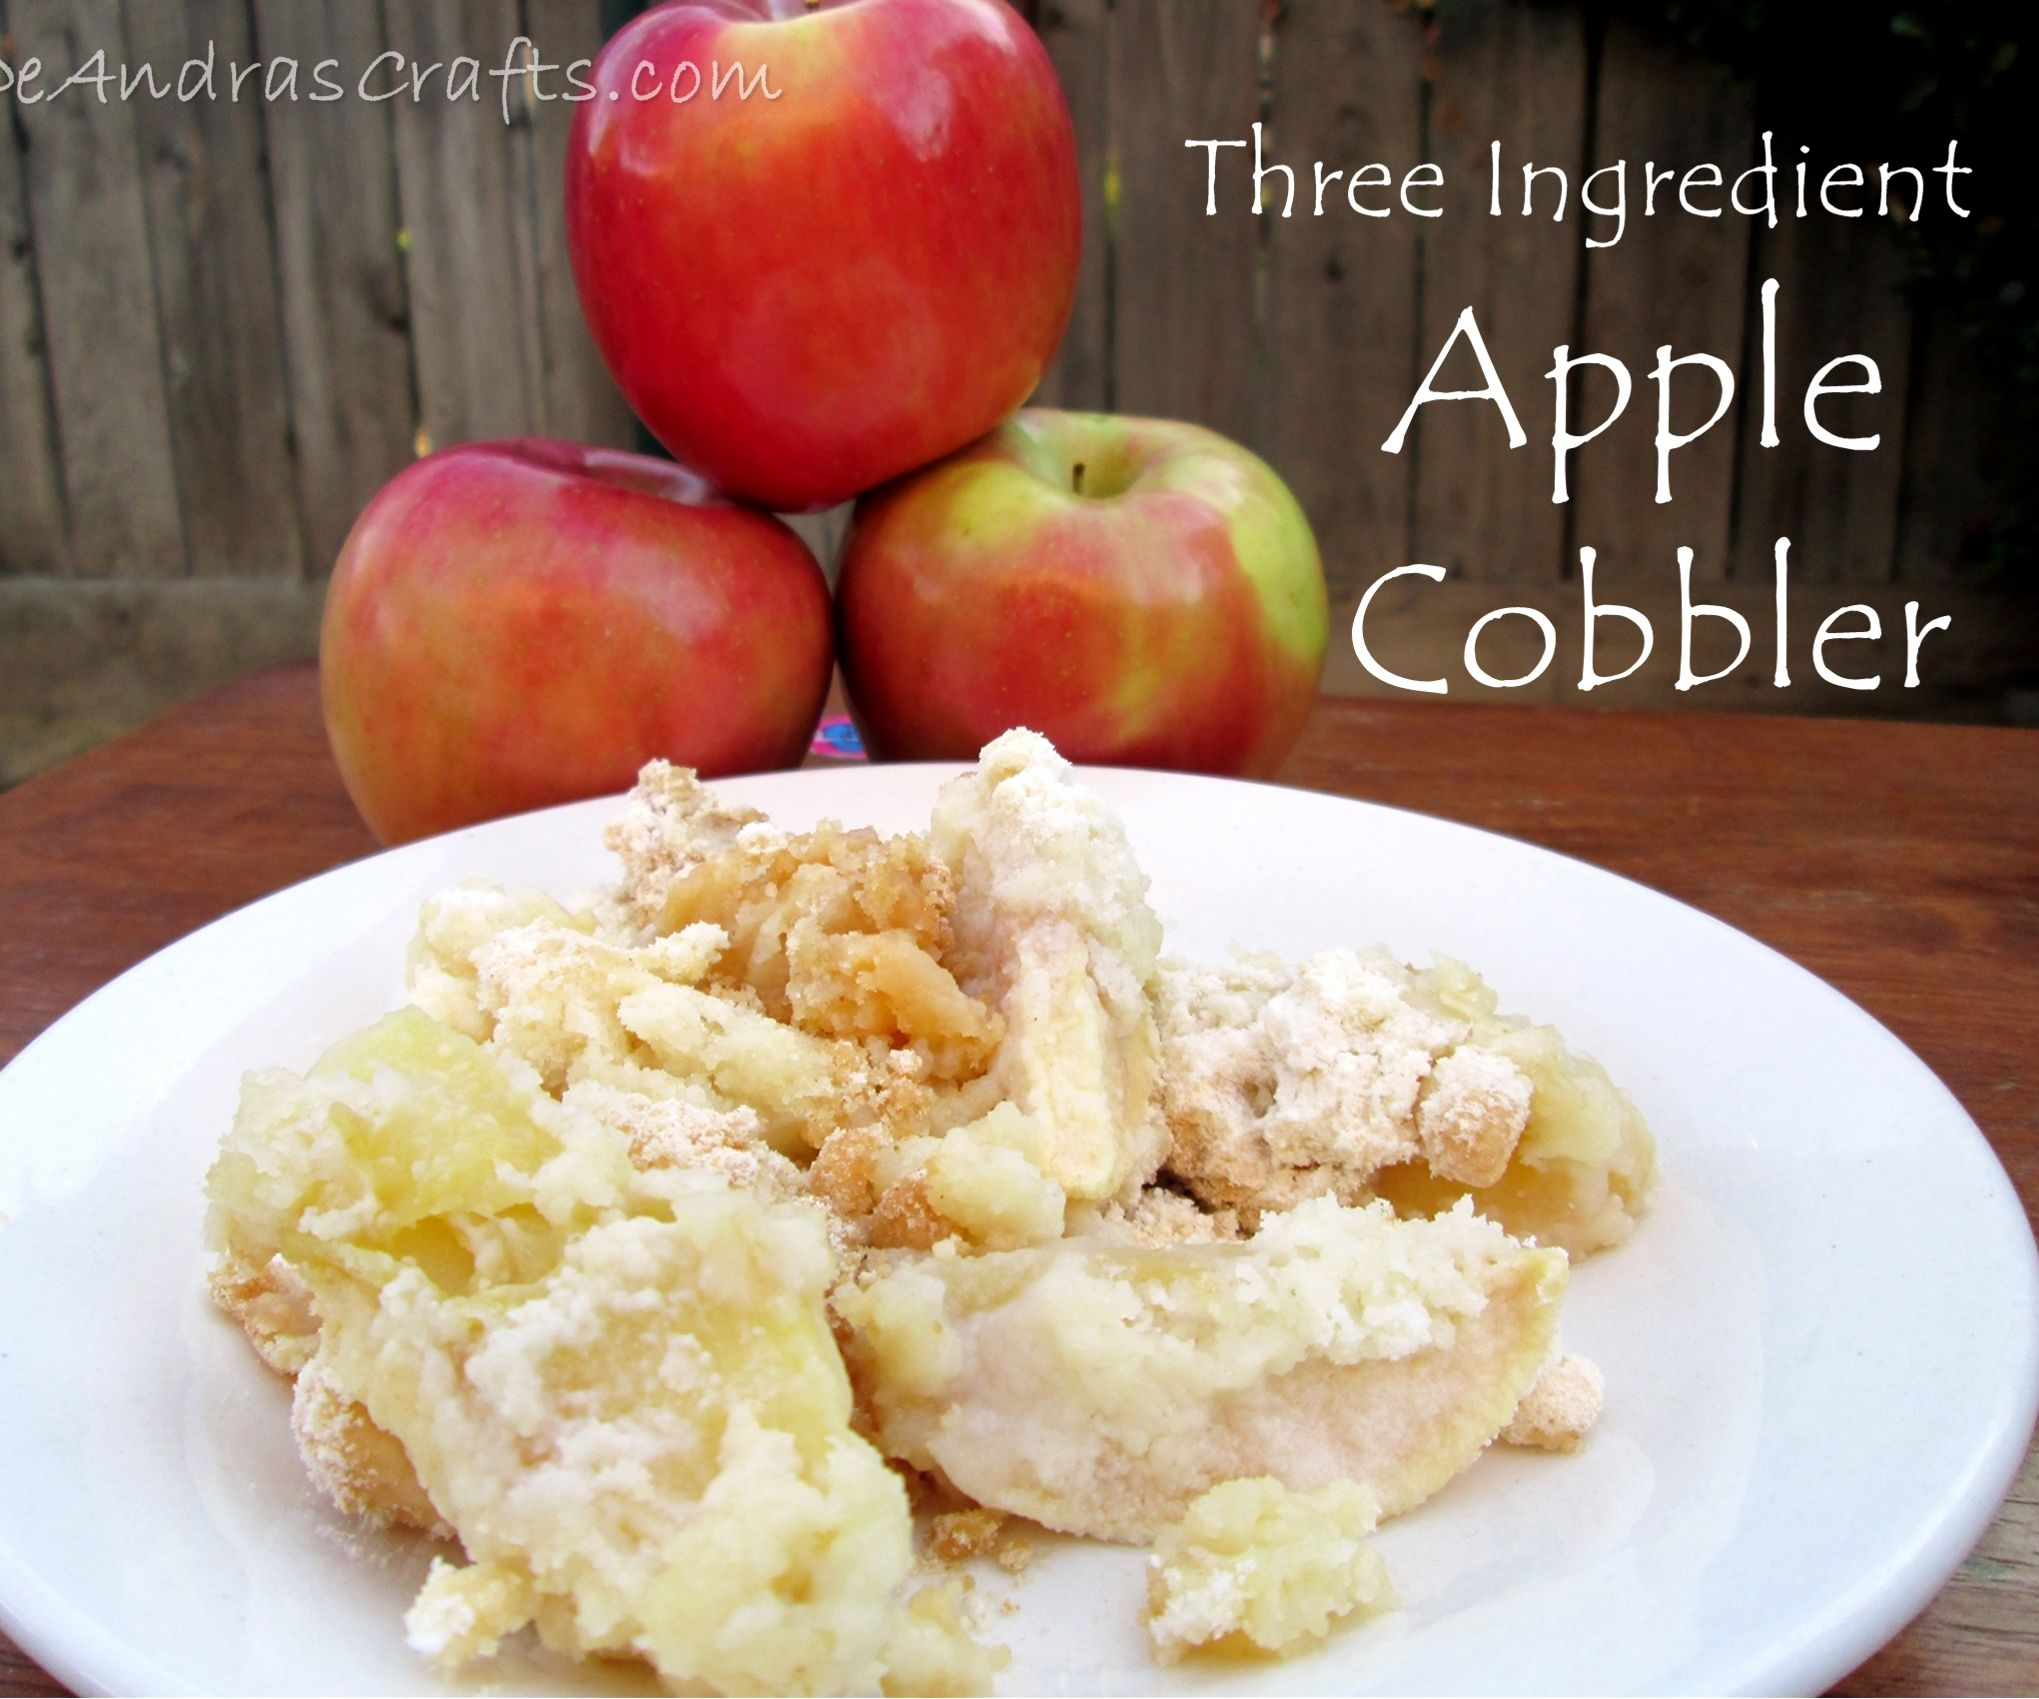 Three-Ingredient Apple Cobbler